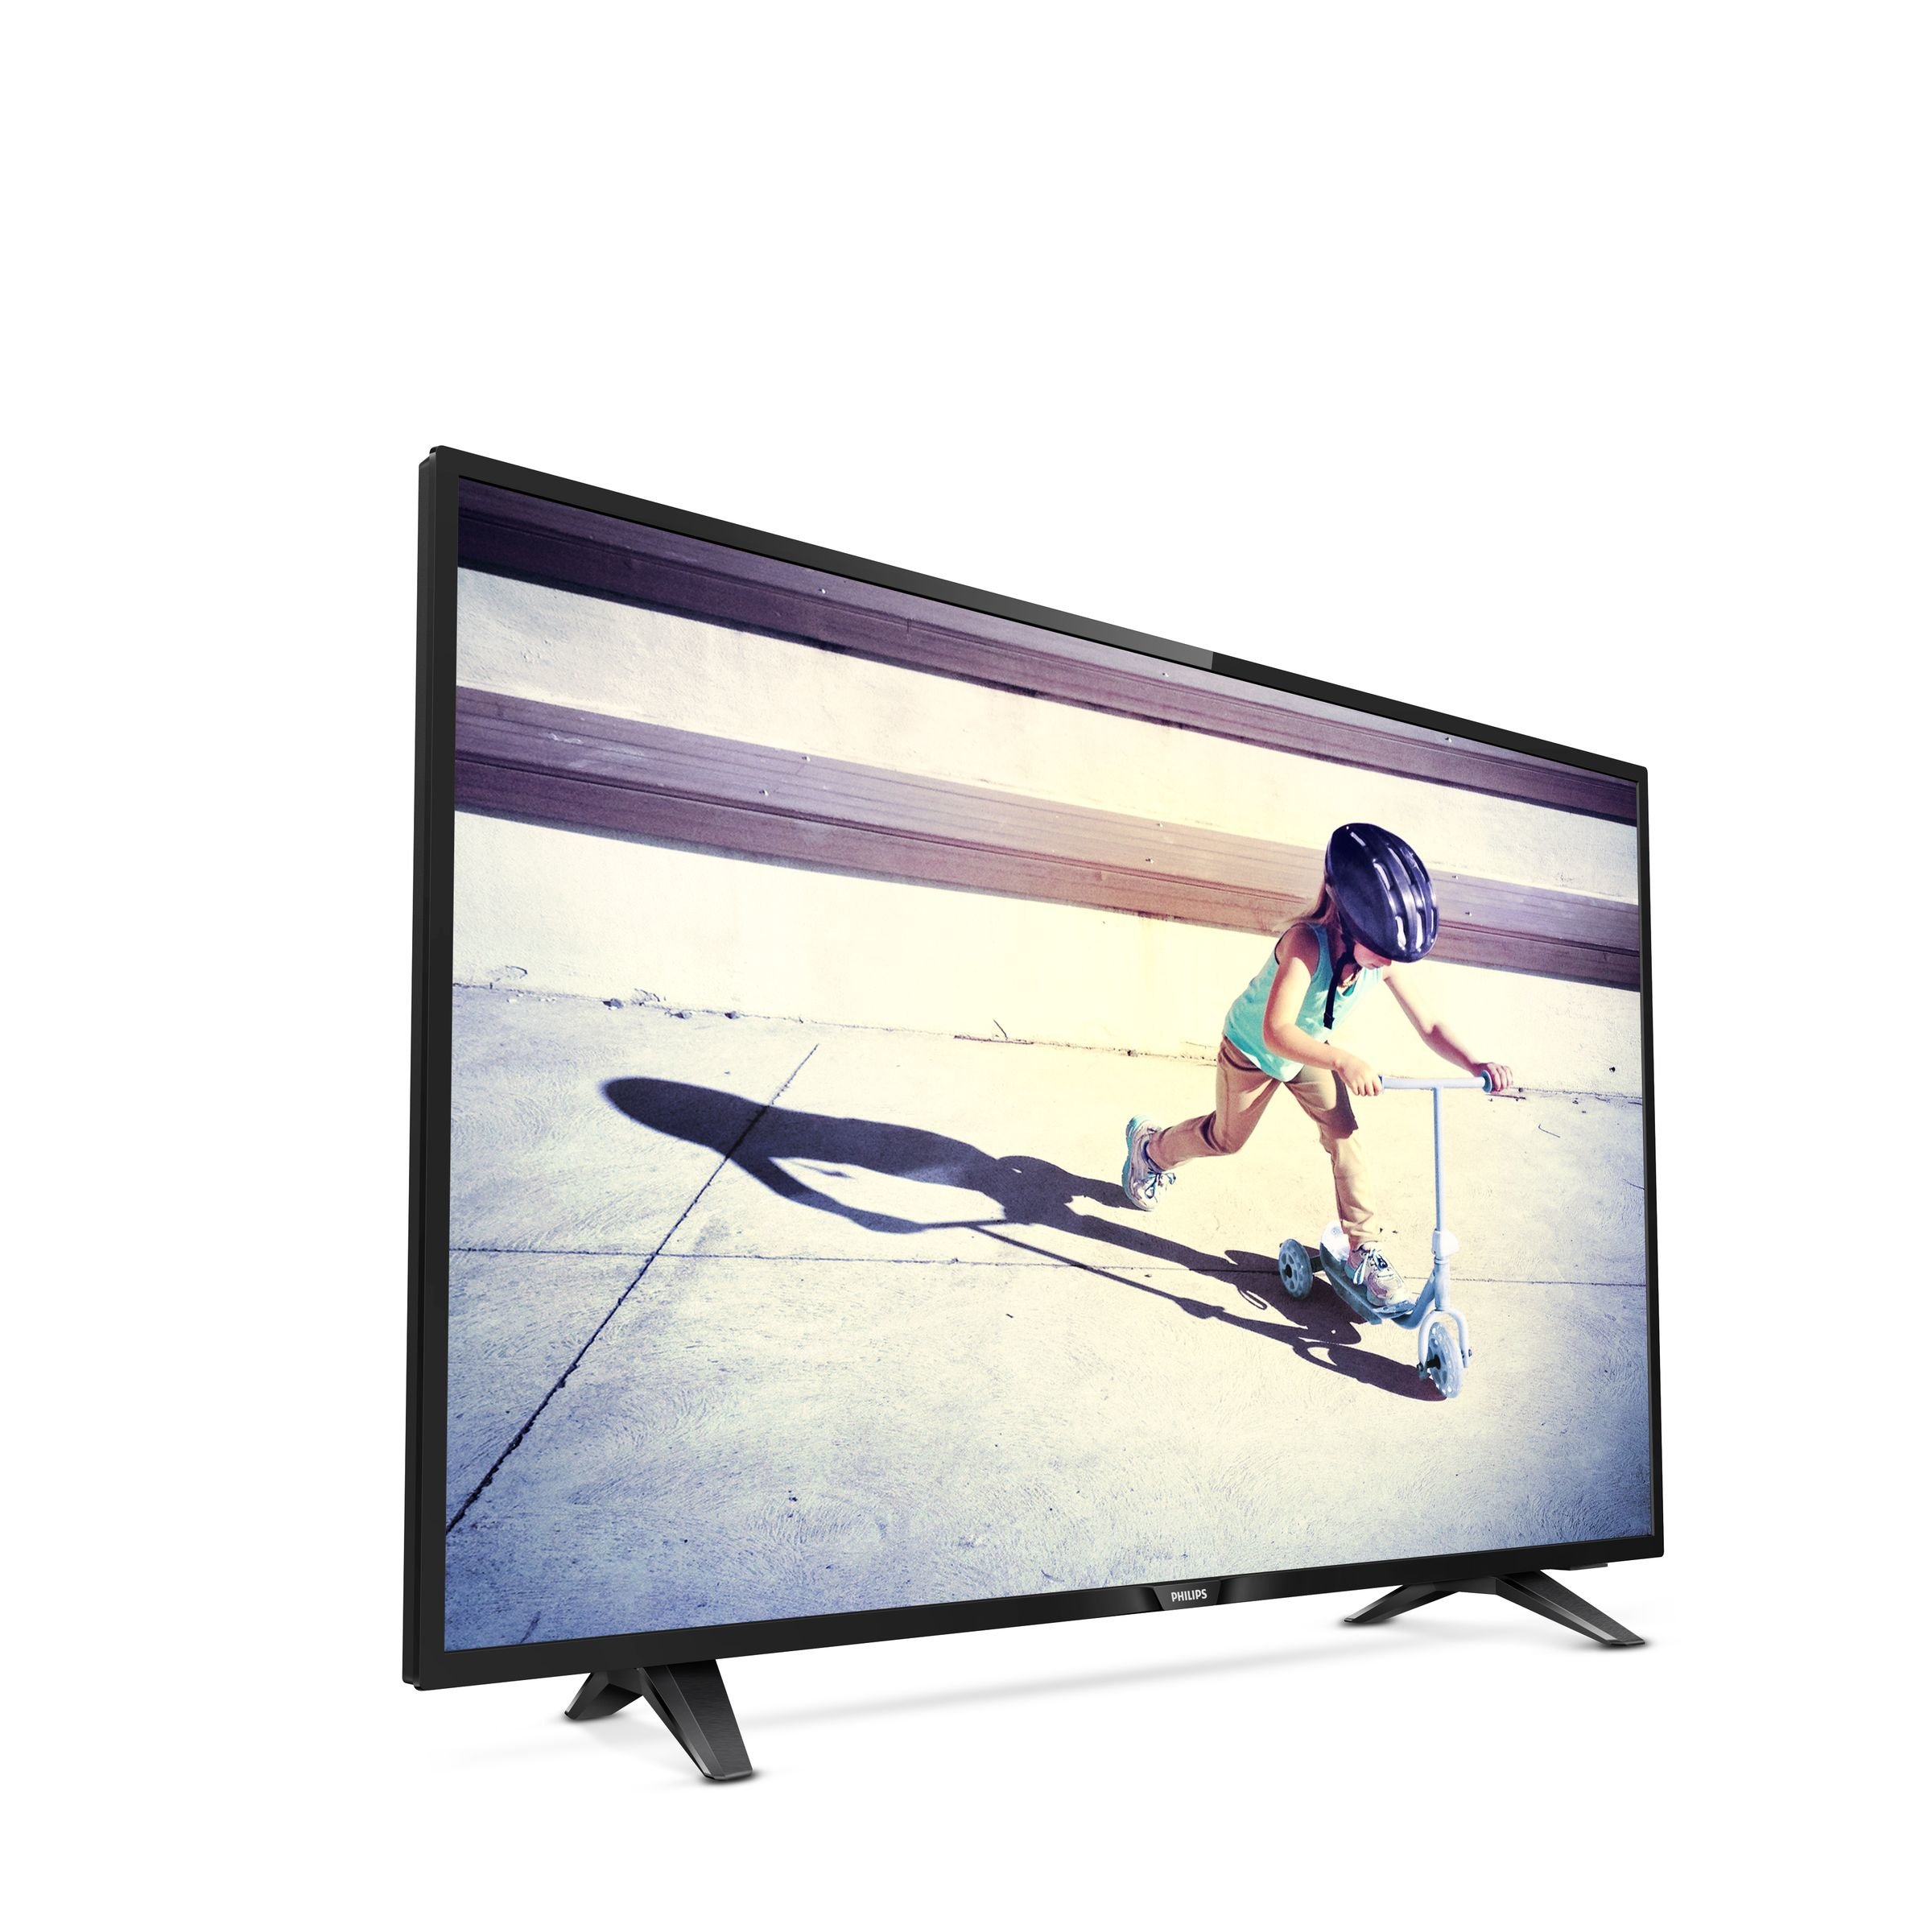 Philips Philips 4100 Series televisor LED Full HD ultrafino ...